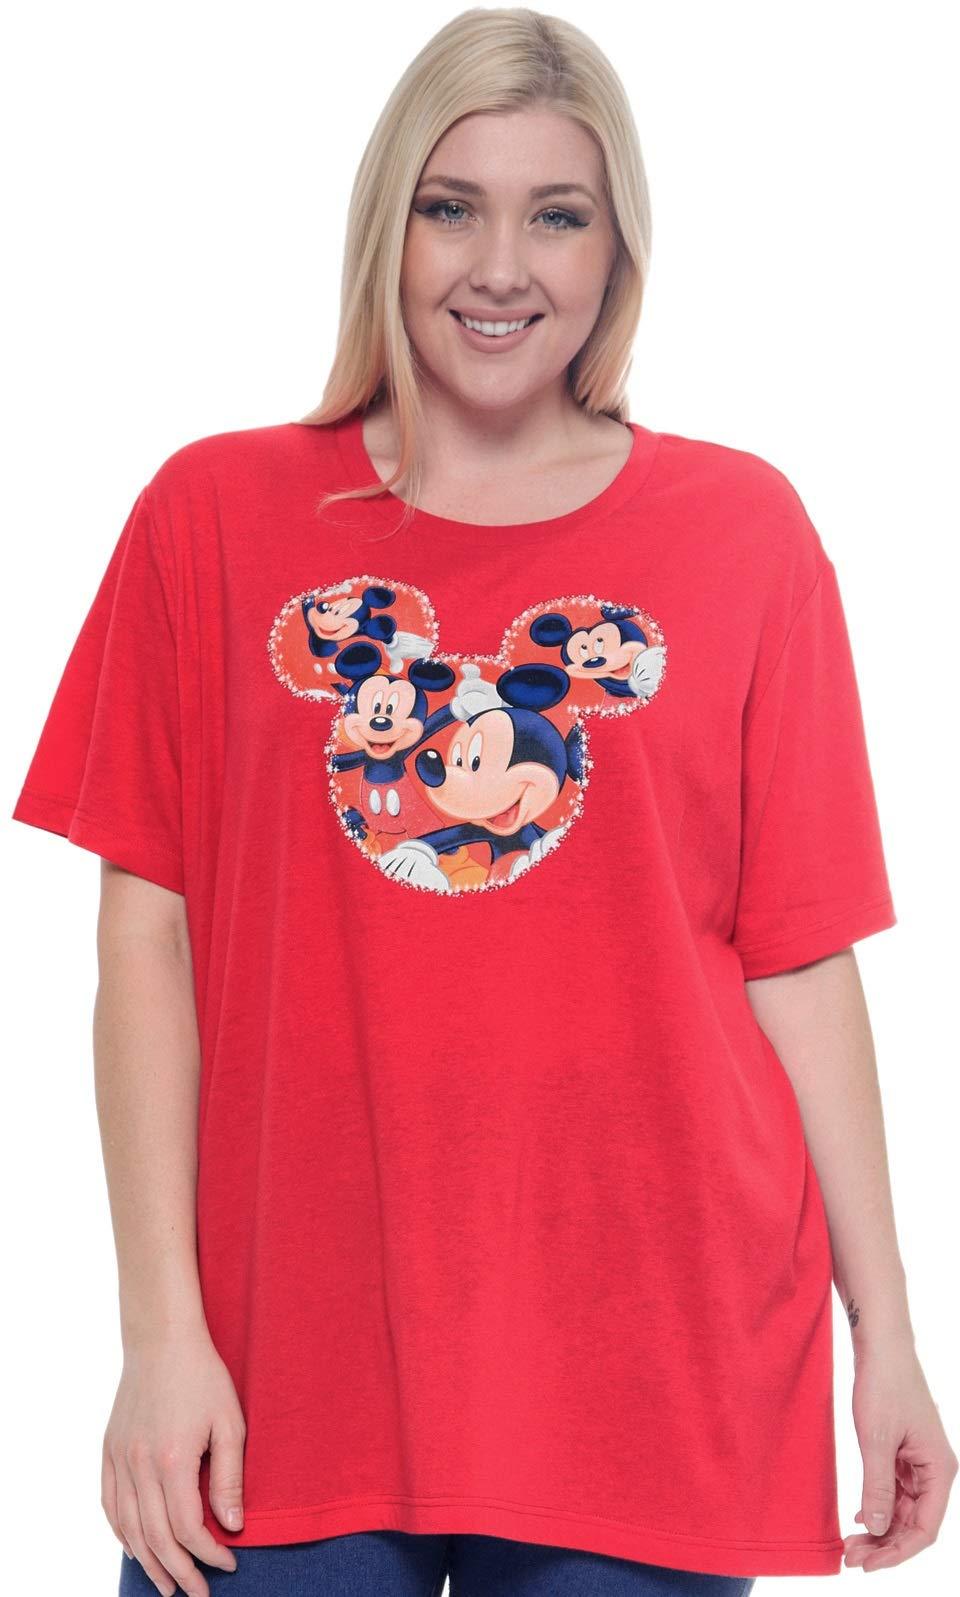 Disney Plus Size Women's T-Shirt Mickey Mouse Icon Print (Red, 1X)